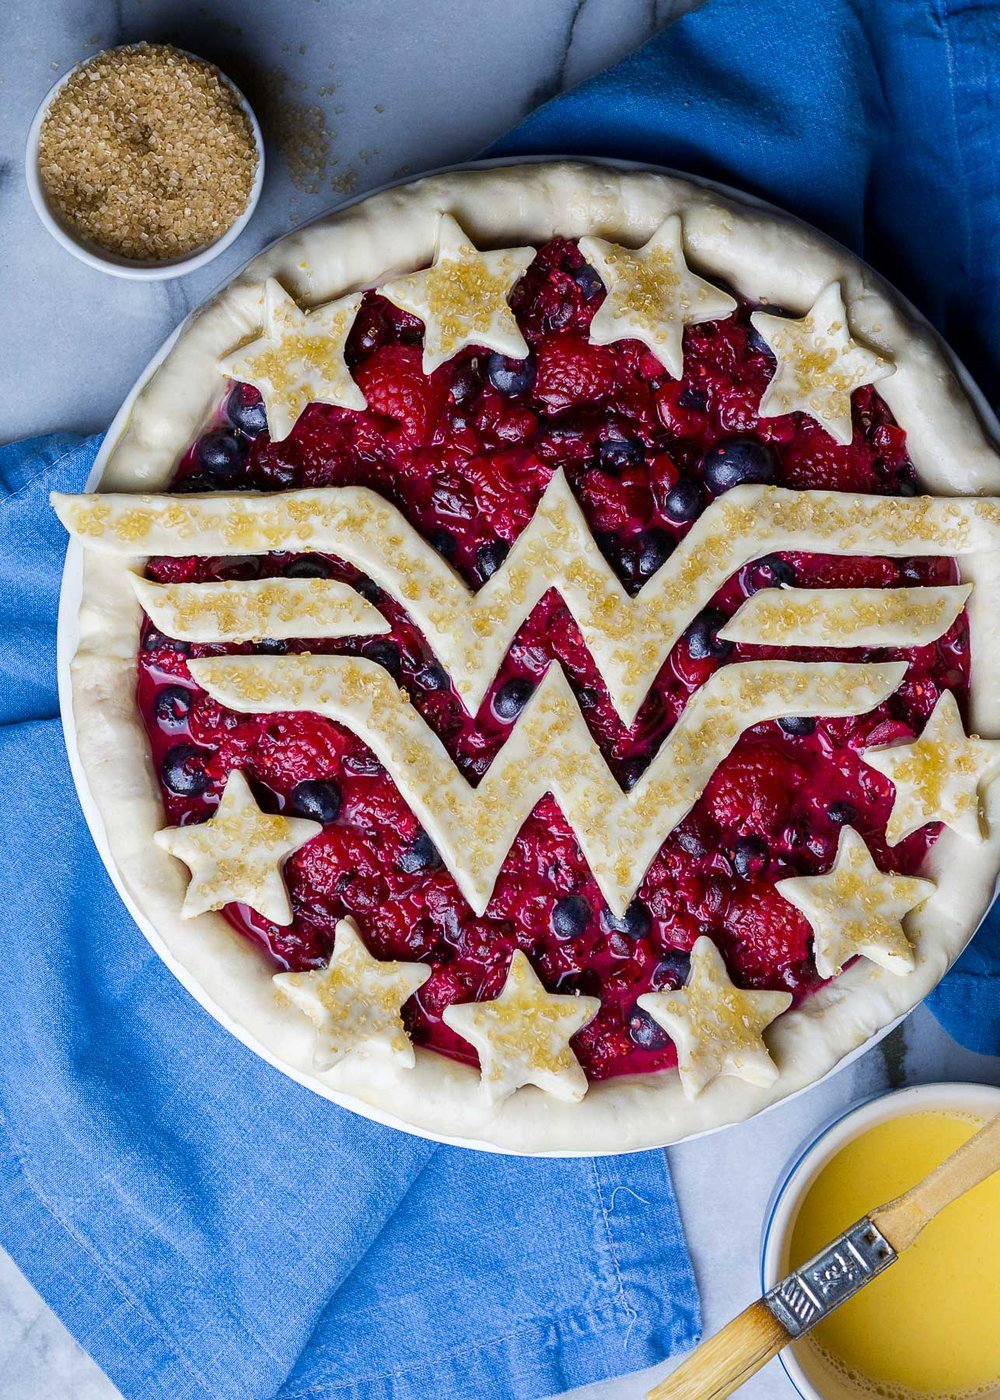 wonder-woman-berry-pie-6.jpg